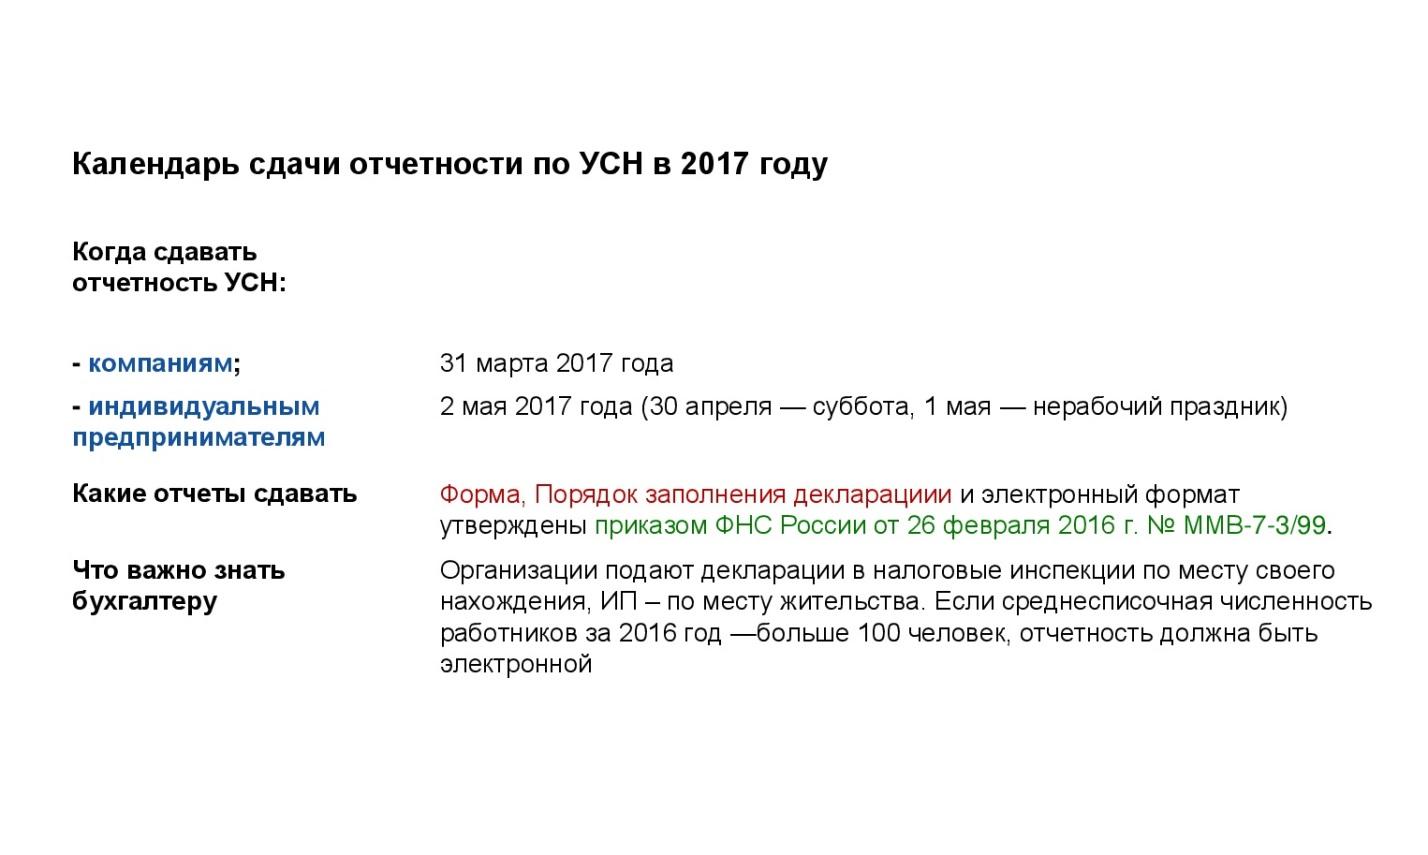 календарь сдачи отчетности УСН 2017